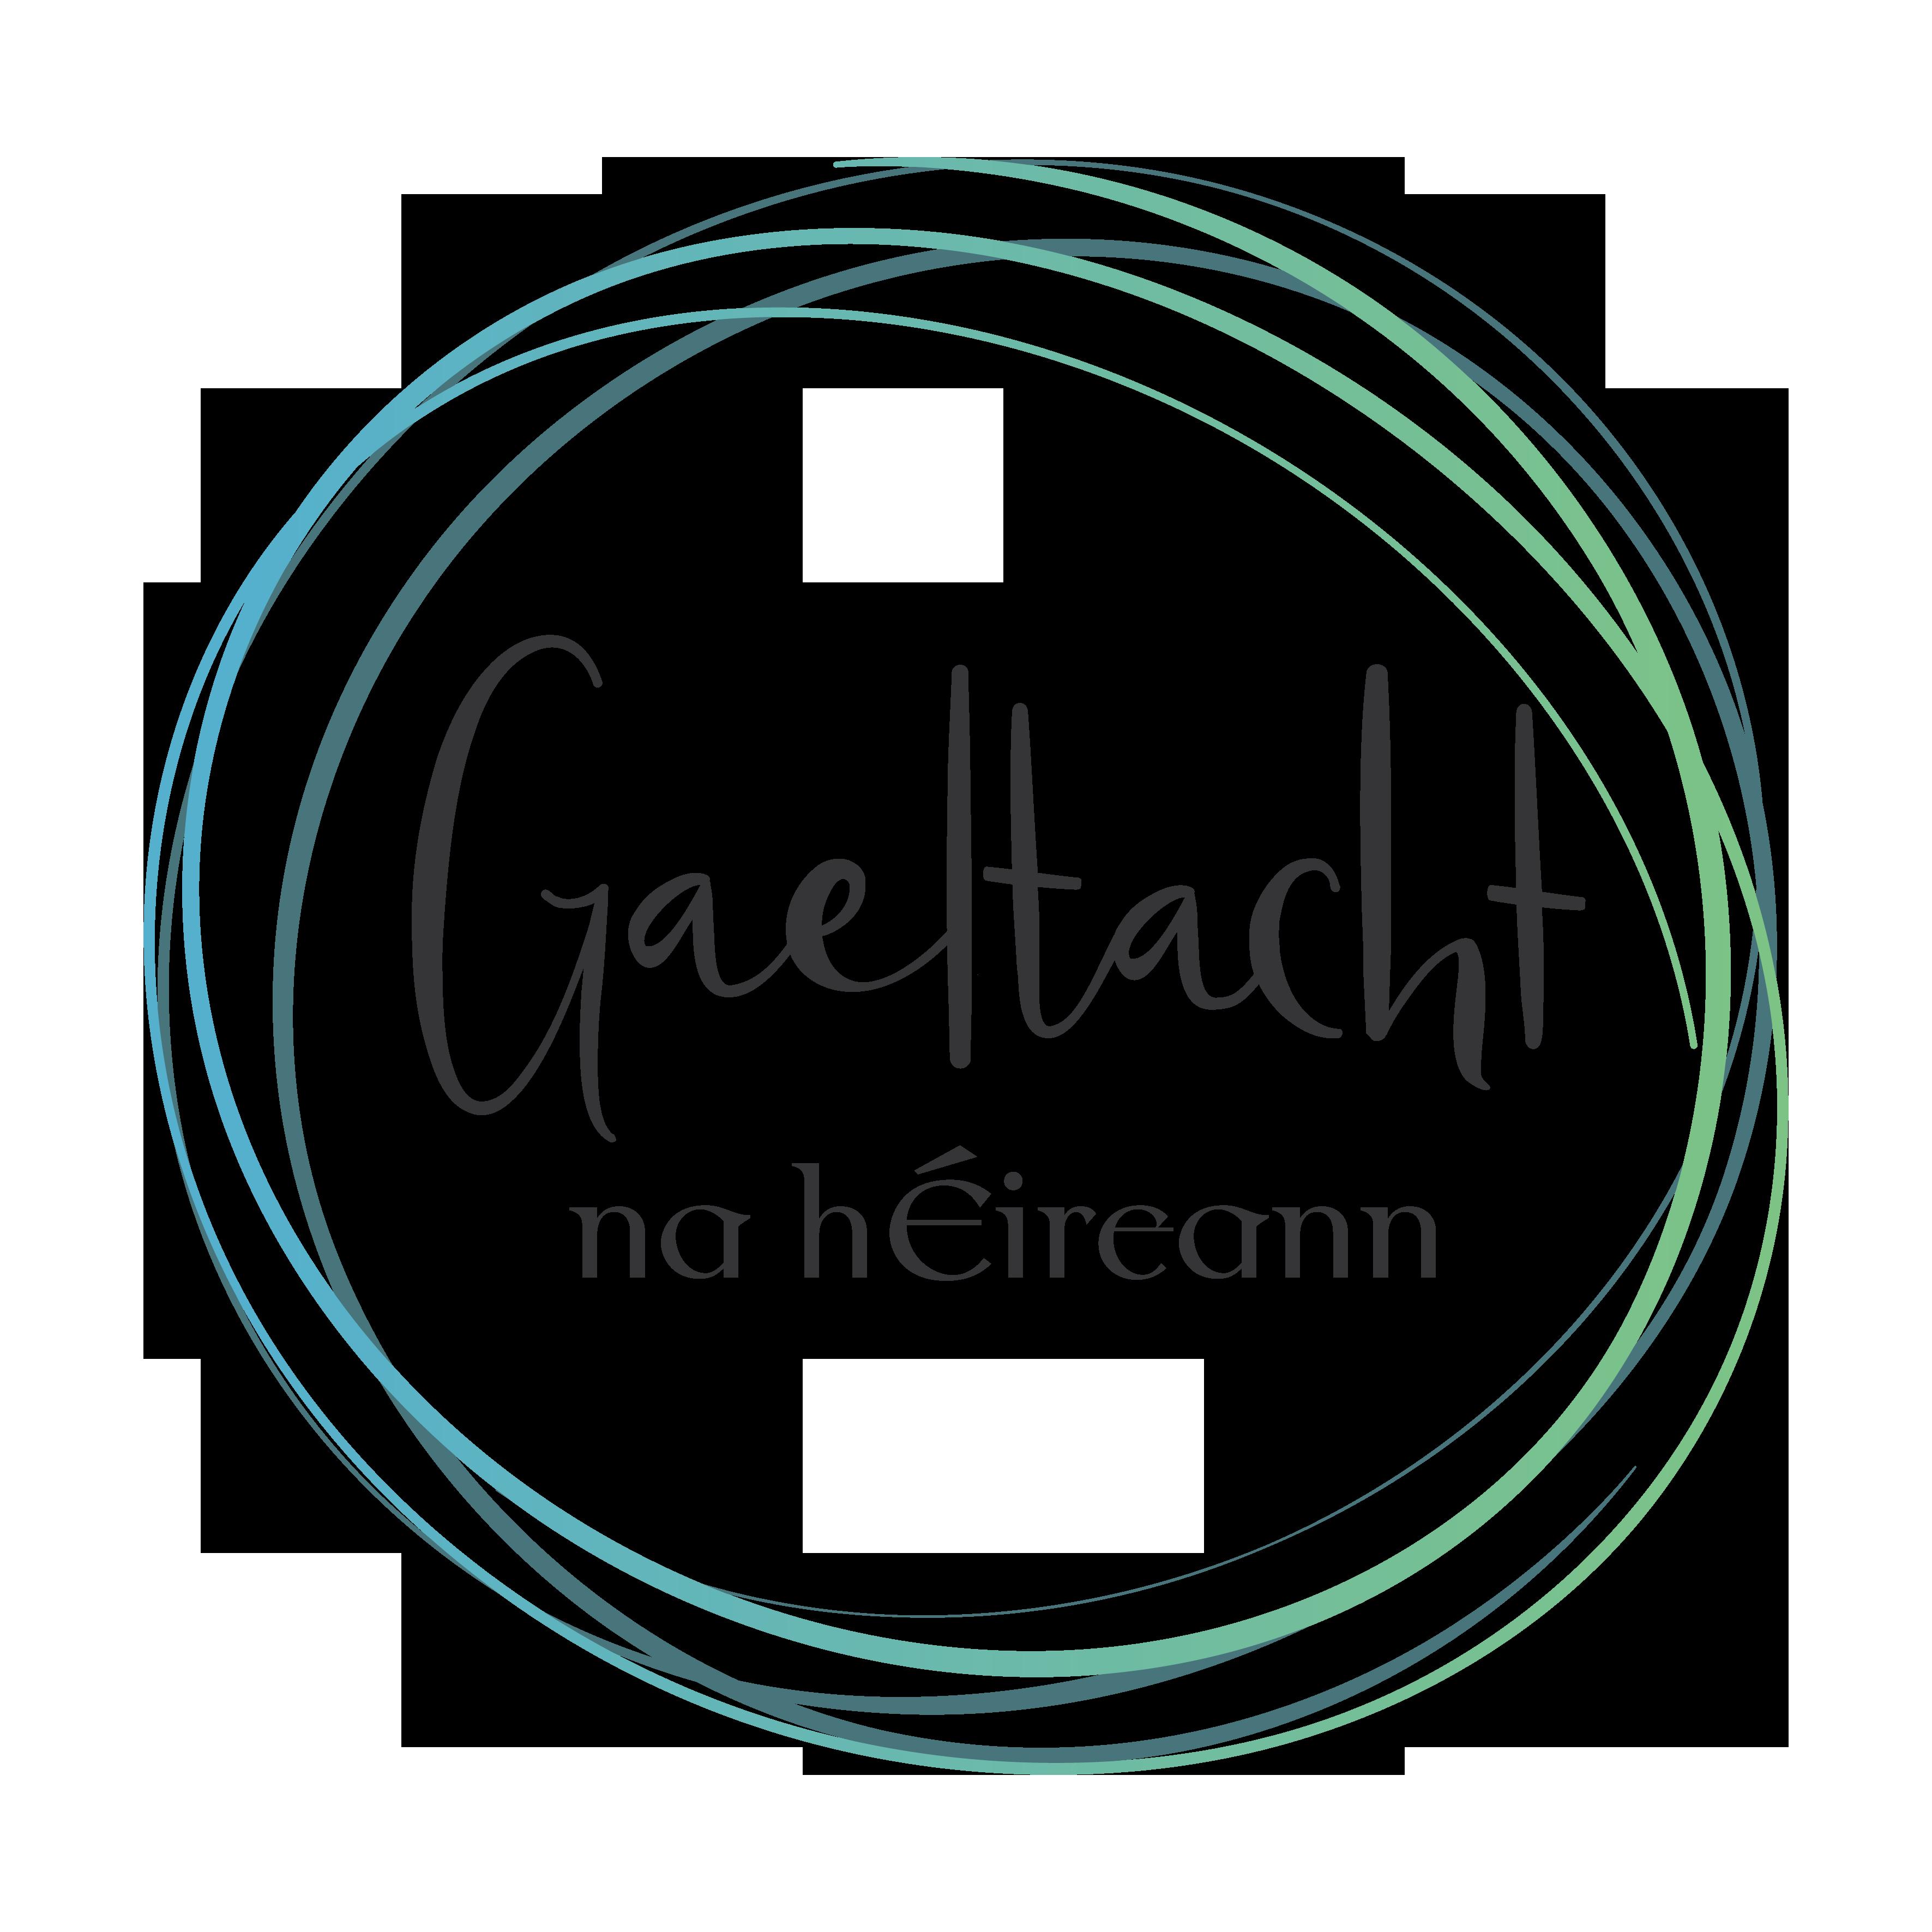 Gaeltacht_4_1_transparent